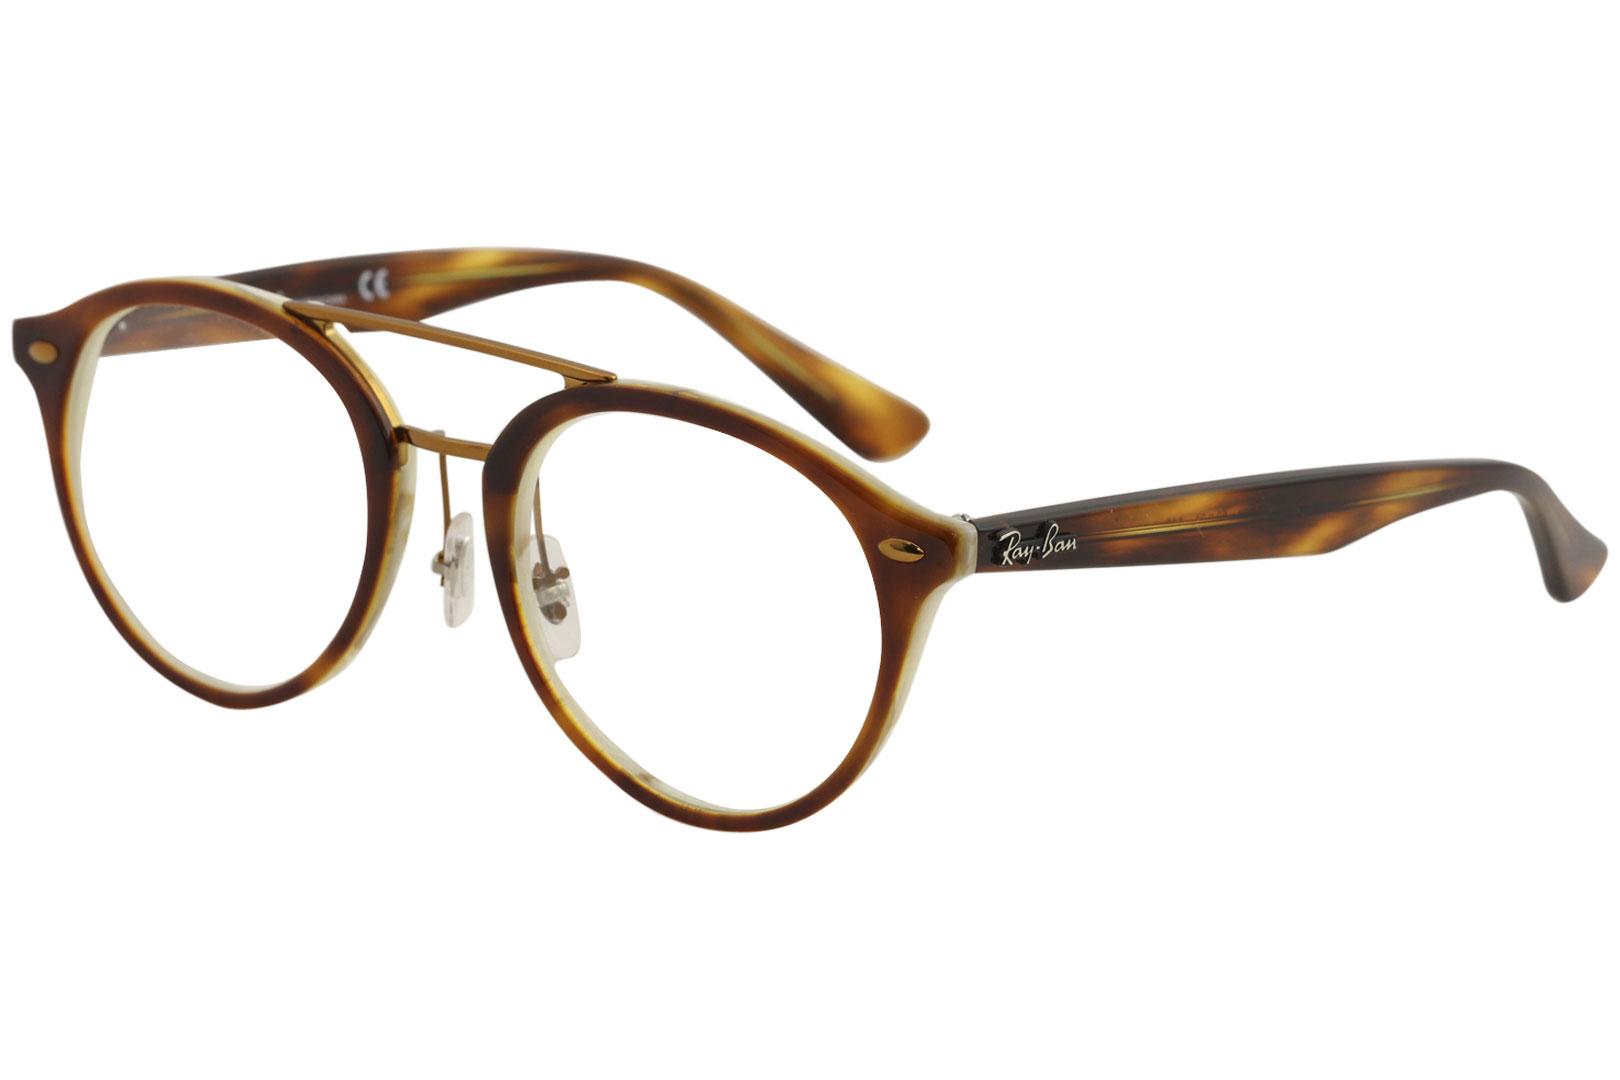 92e6e9a0ddd10 Ray Ban Eyeglasses RX5354 5354 5677 Havana Brown Horn Beige Optical ...